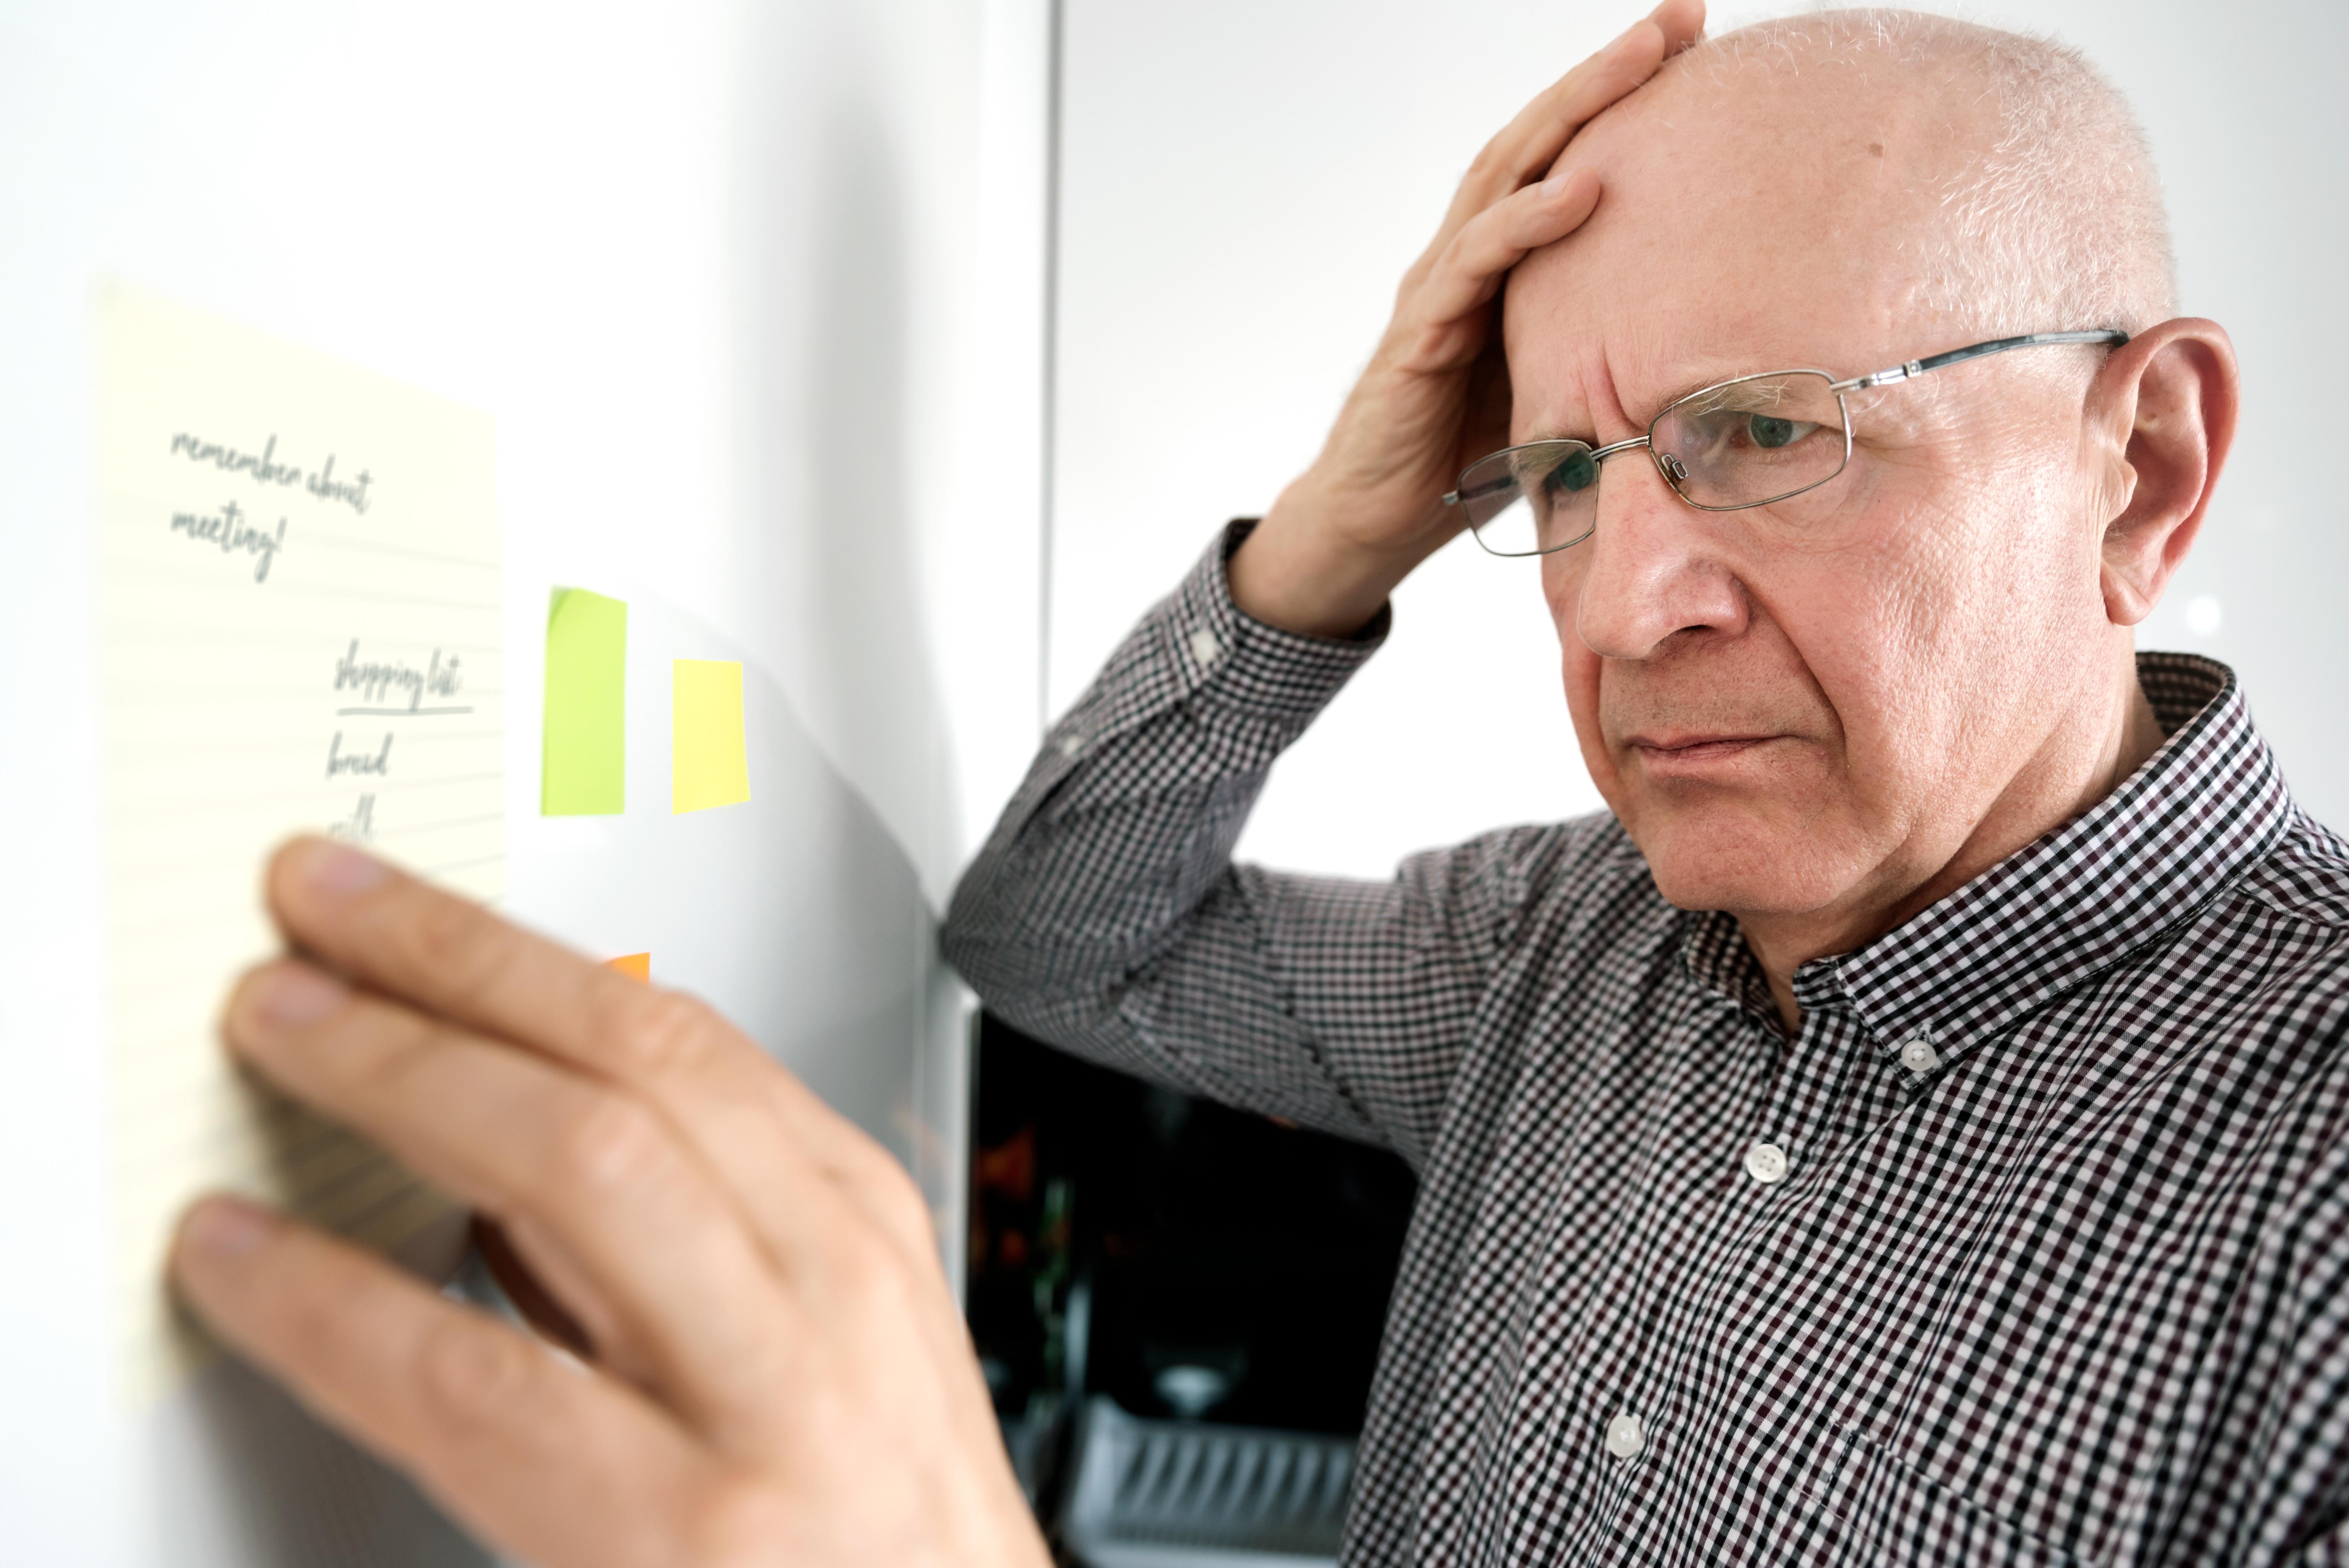 Delirium vs. Dementia: What's the Difference?